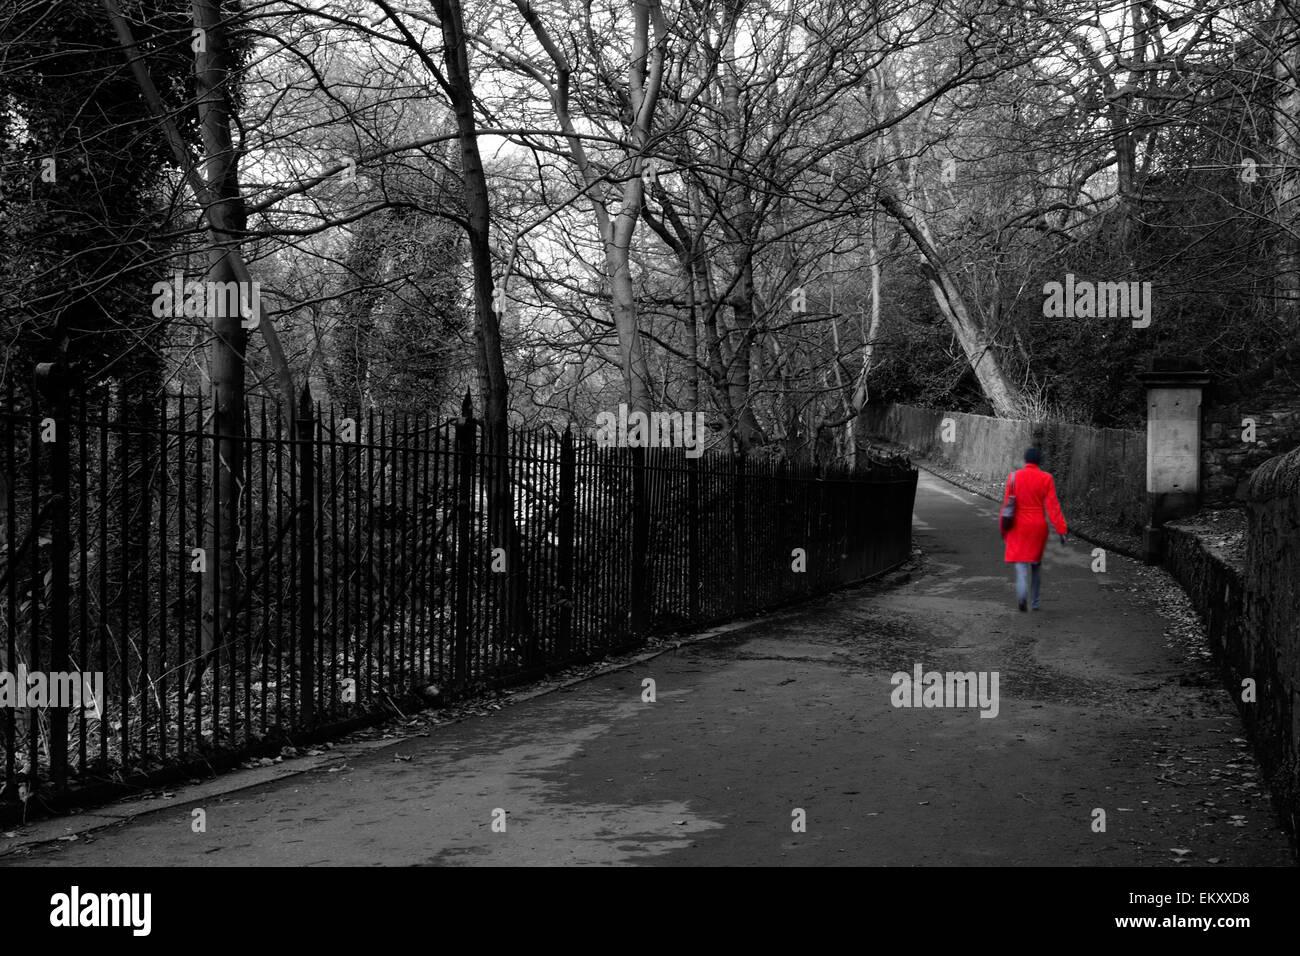 Girl In A Bright Red Coat Walking In a Park of Edinburg, Scotland - Stock Image